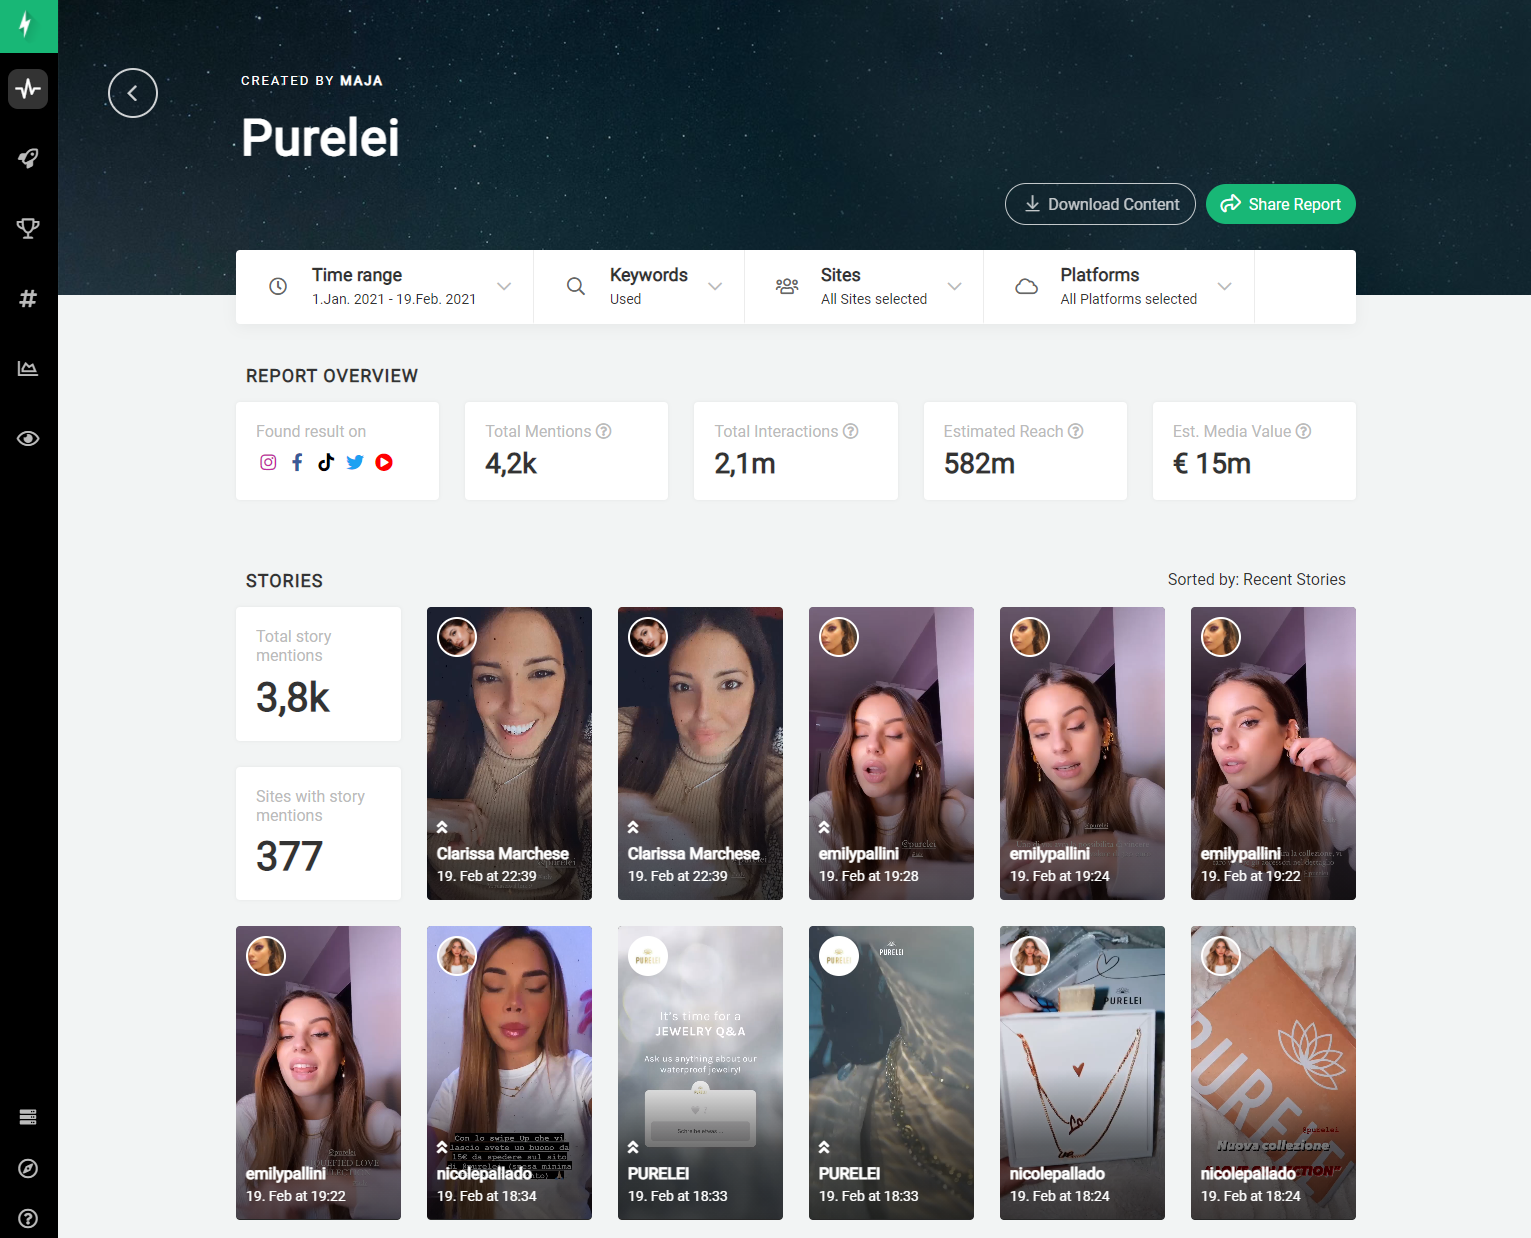 storyclash influencer marketing platforms